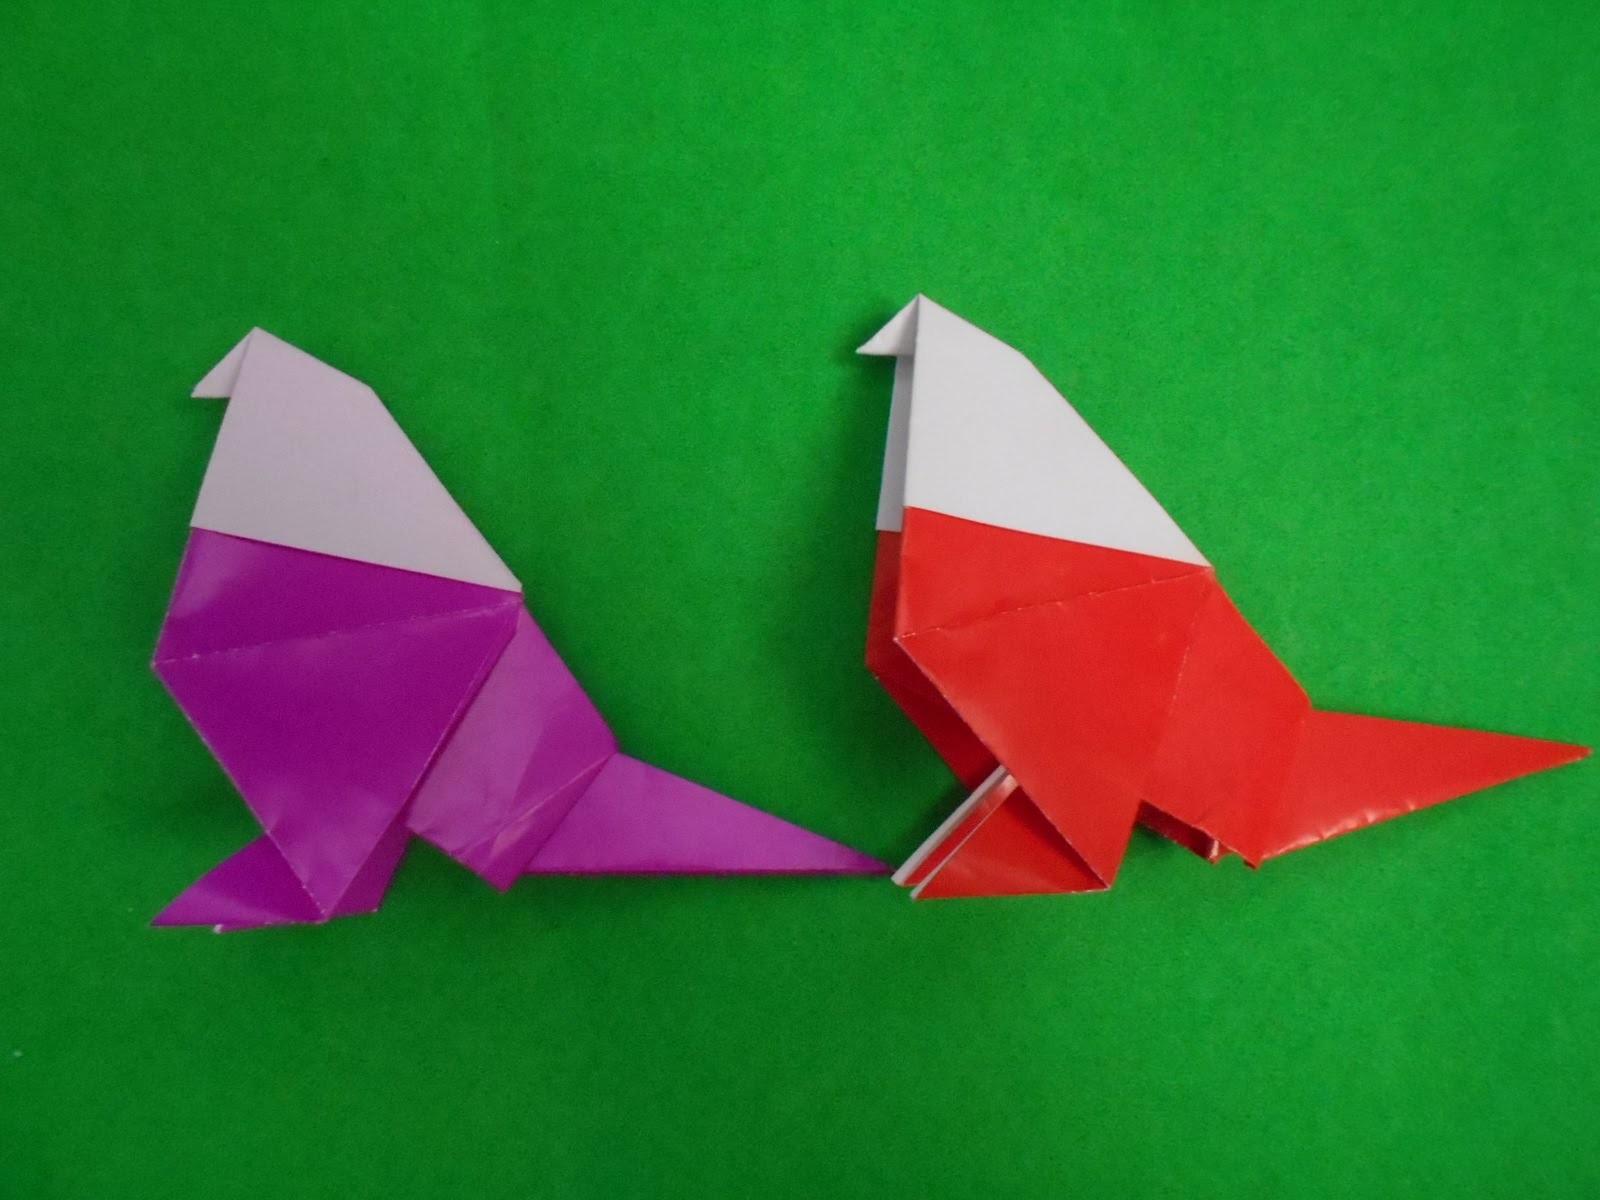 ORIGAMI ANIMALS - How To Fold Origami Dove Easy Instructions | Origami bird